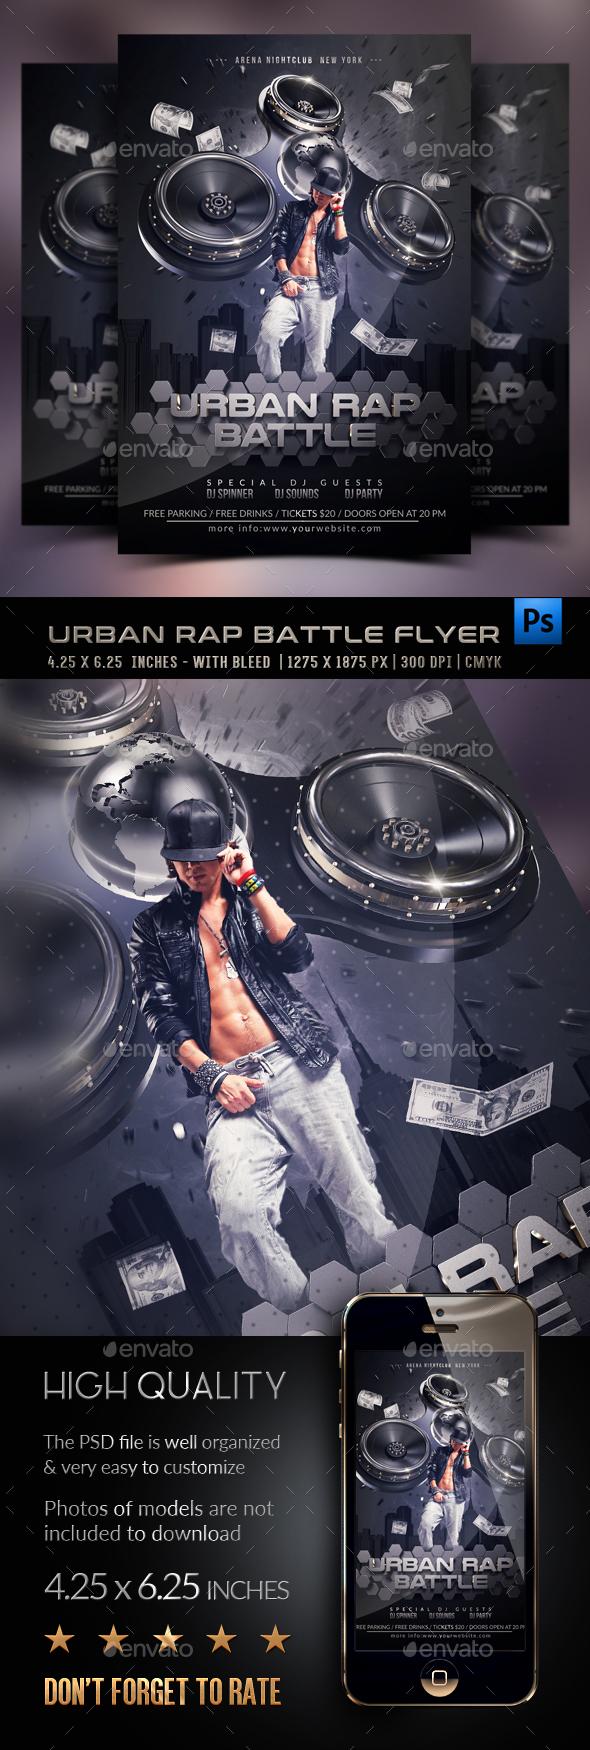 Urban Rap Battle Template - Clubs & Parties Events